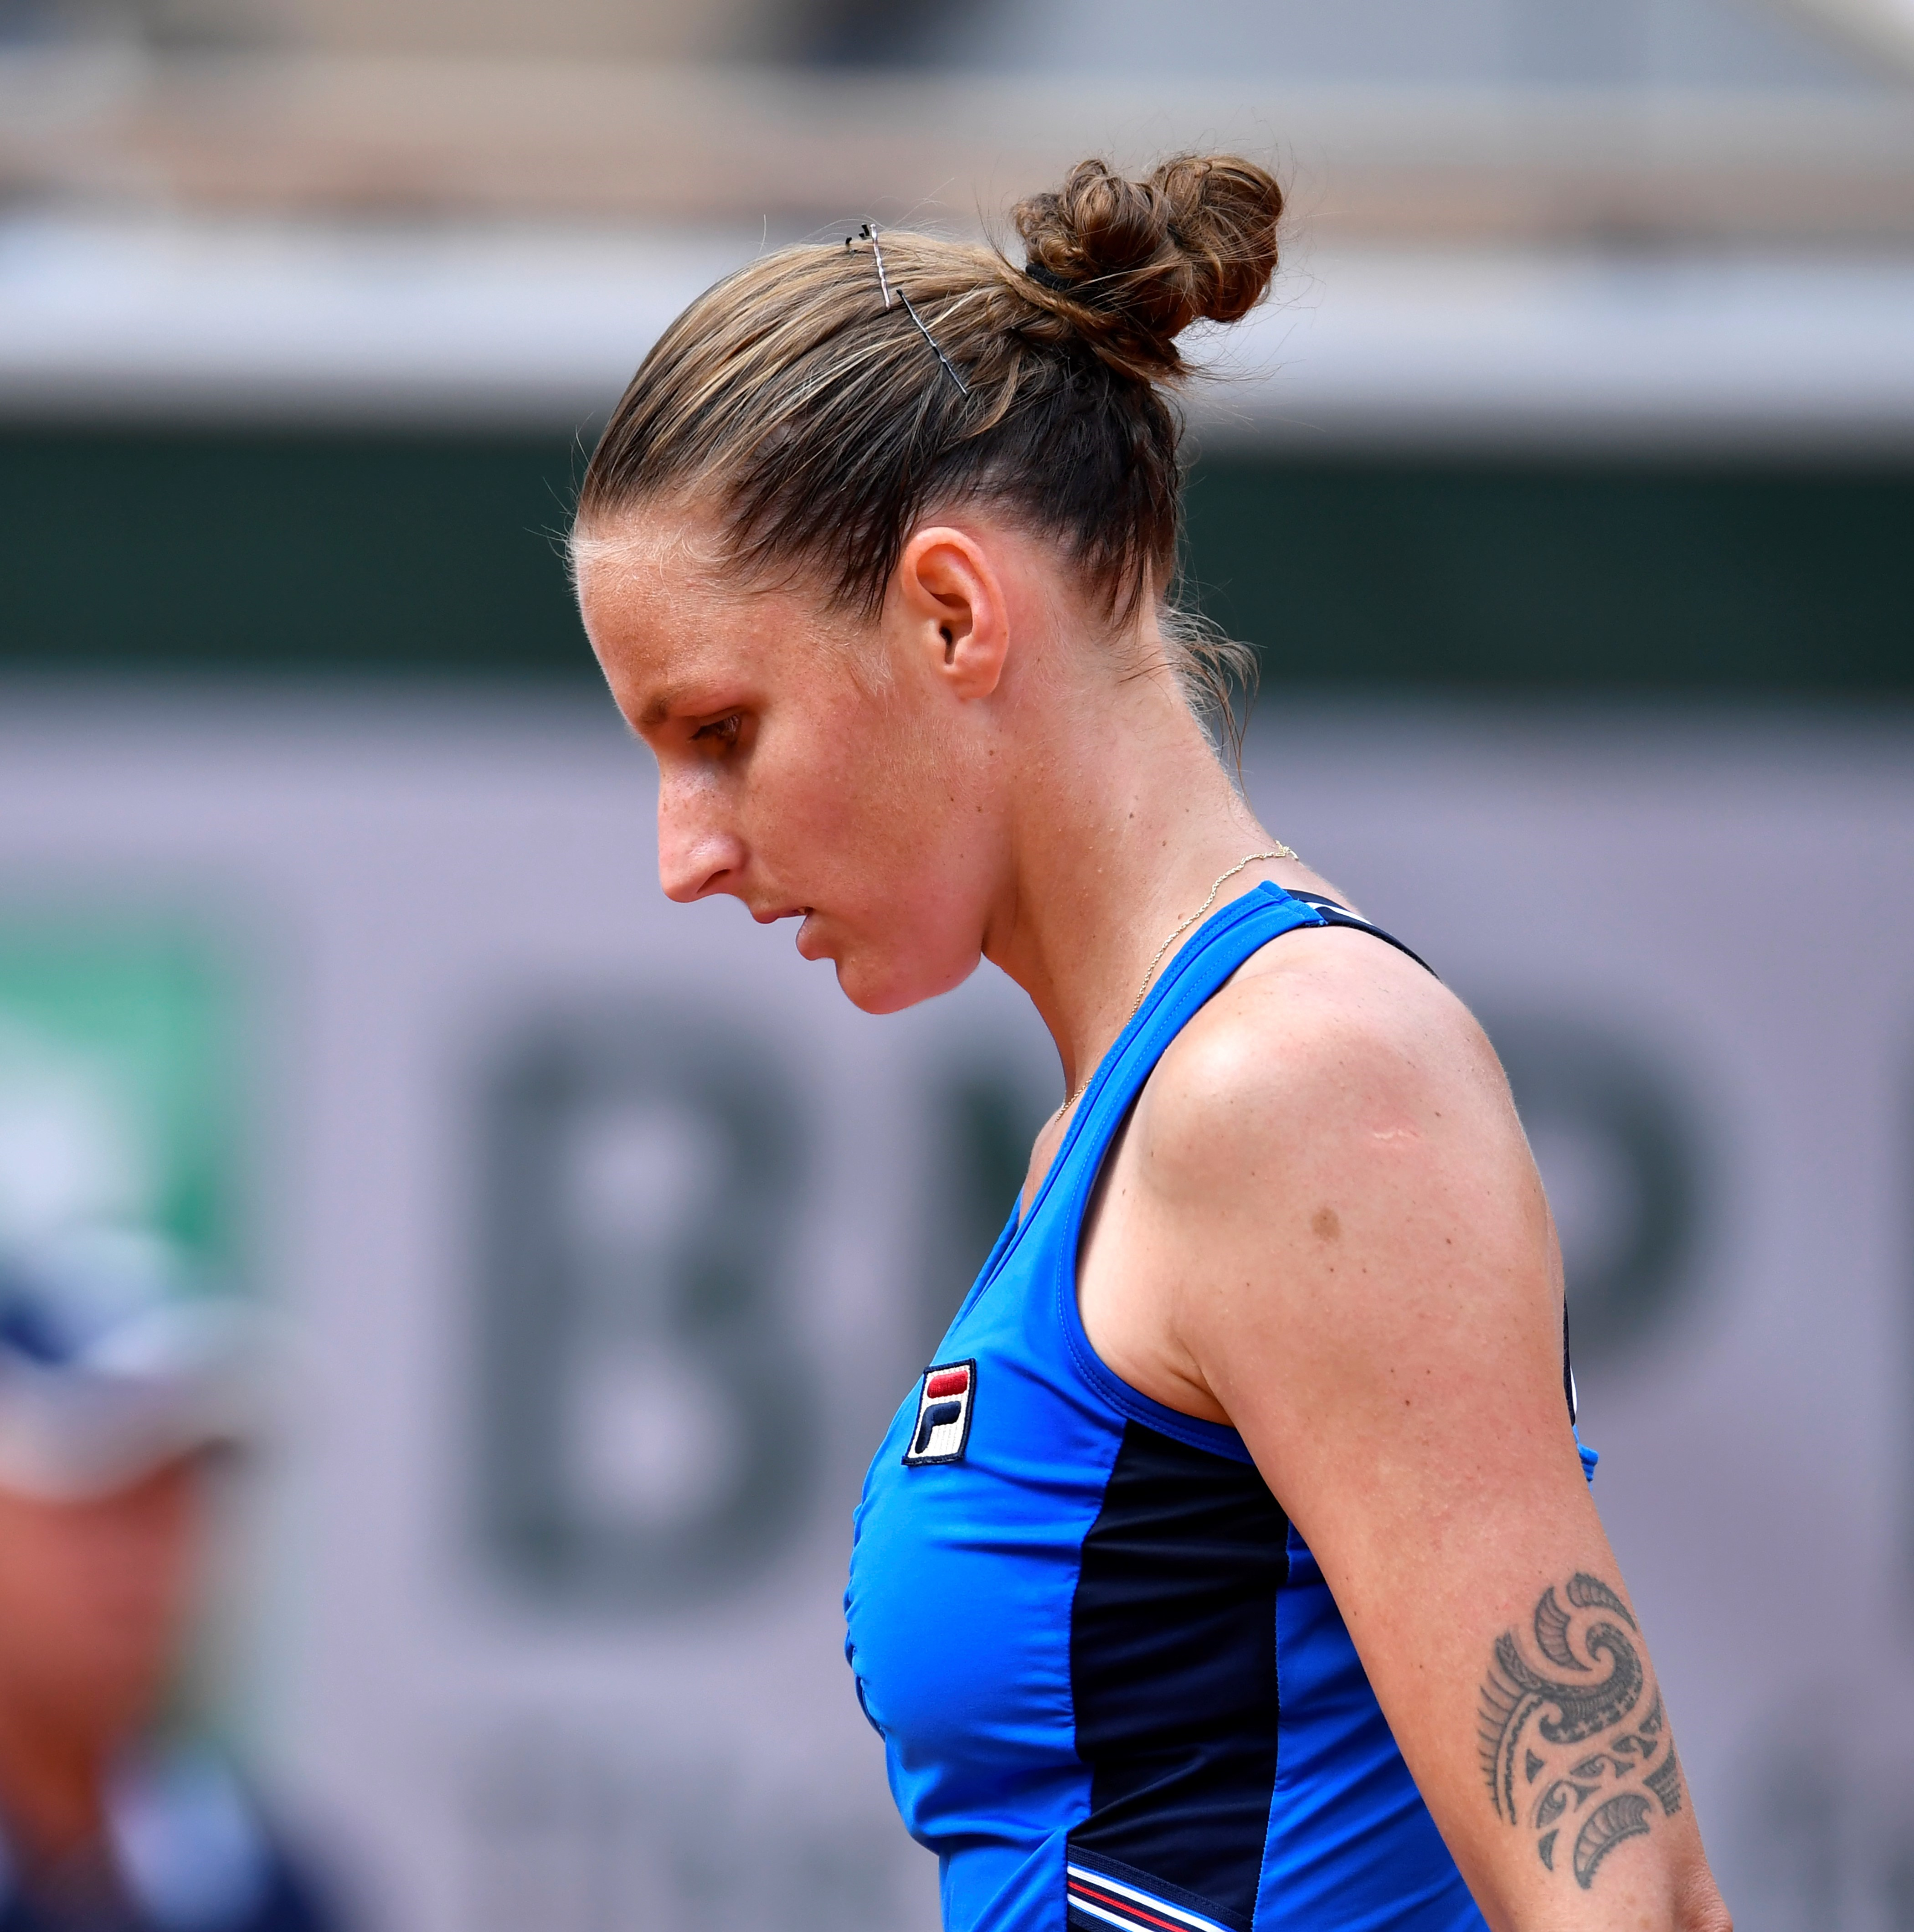 Karolina Pliskova lors de Roland-Garros 2019